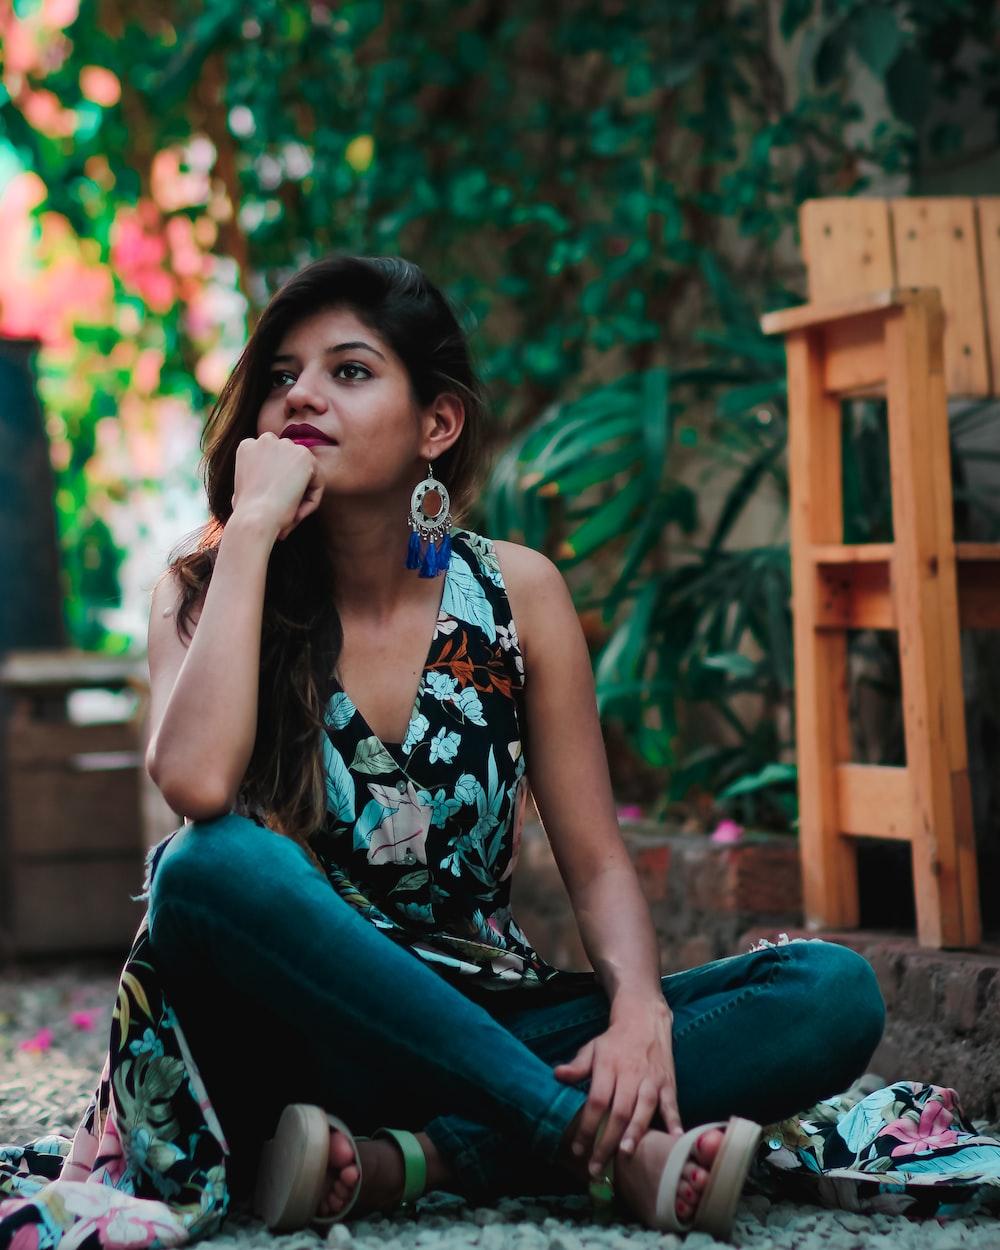 woman sitting on gravel